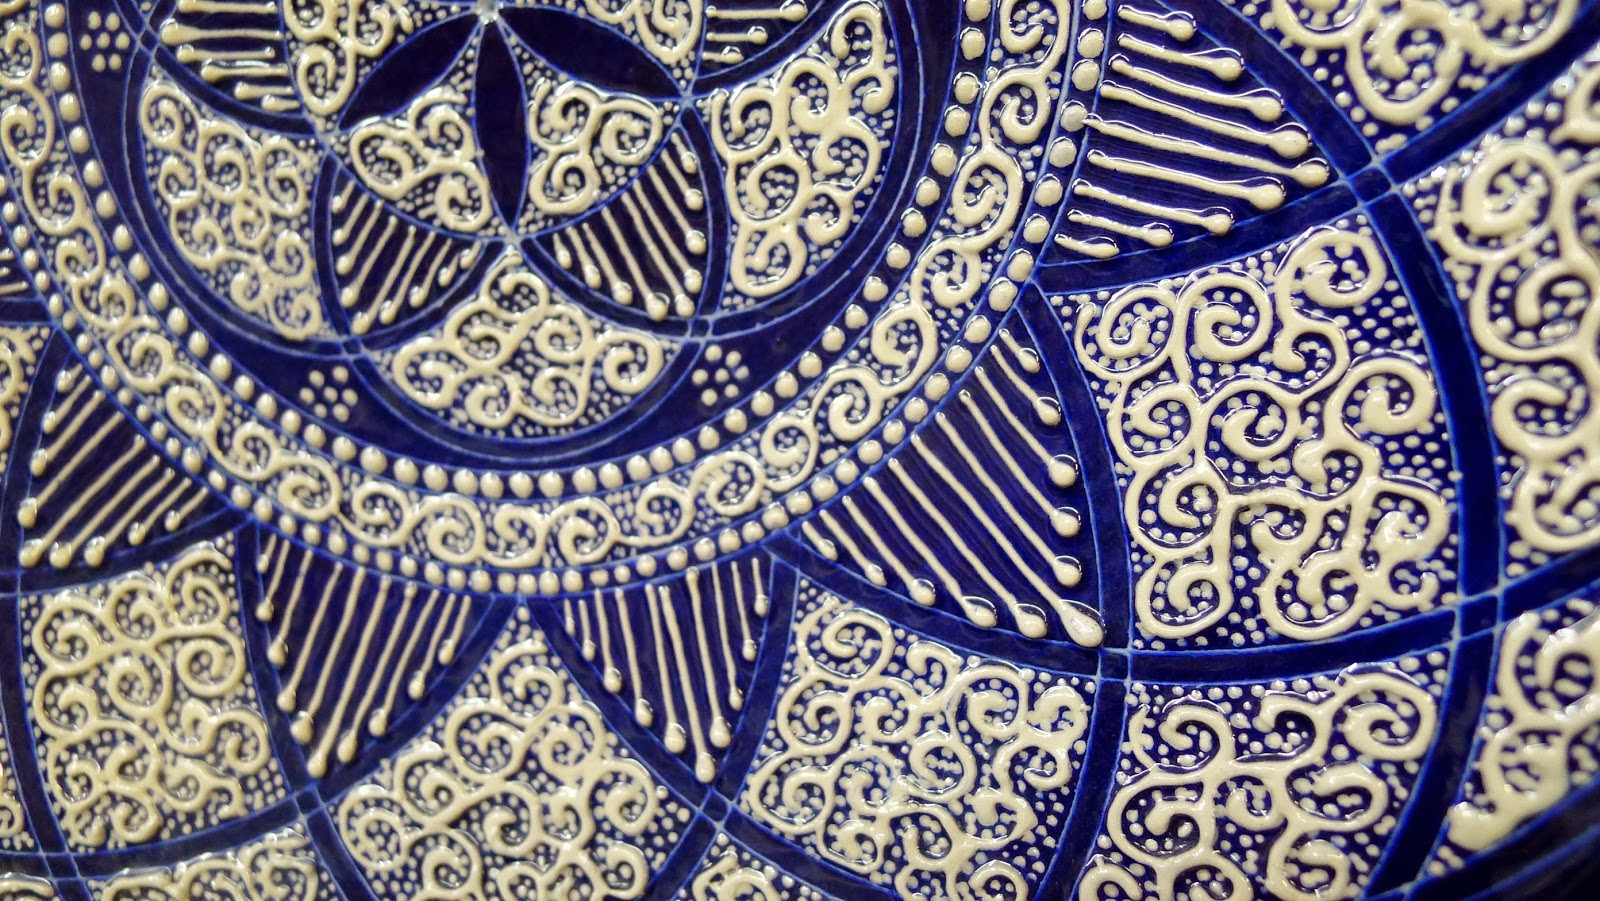 Art Design Ideas : Turkish art design pixshark images galleries